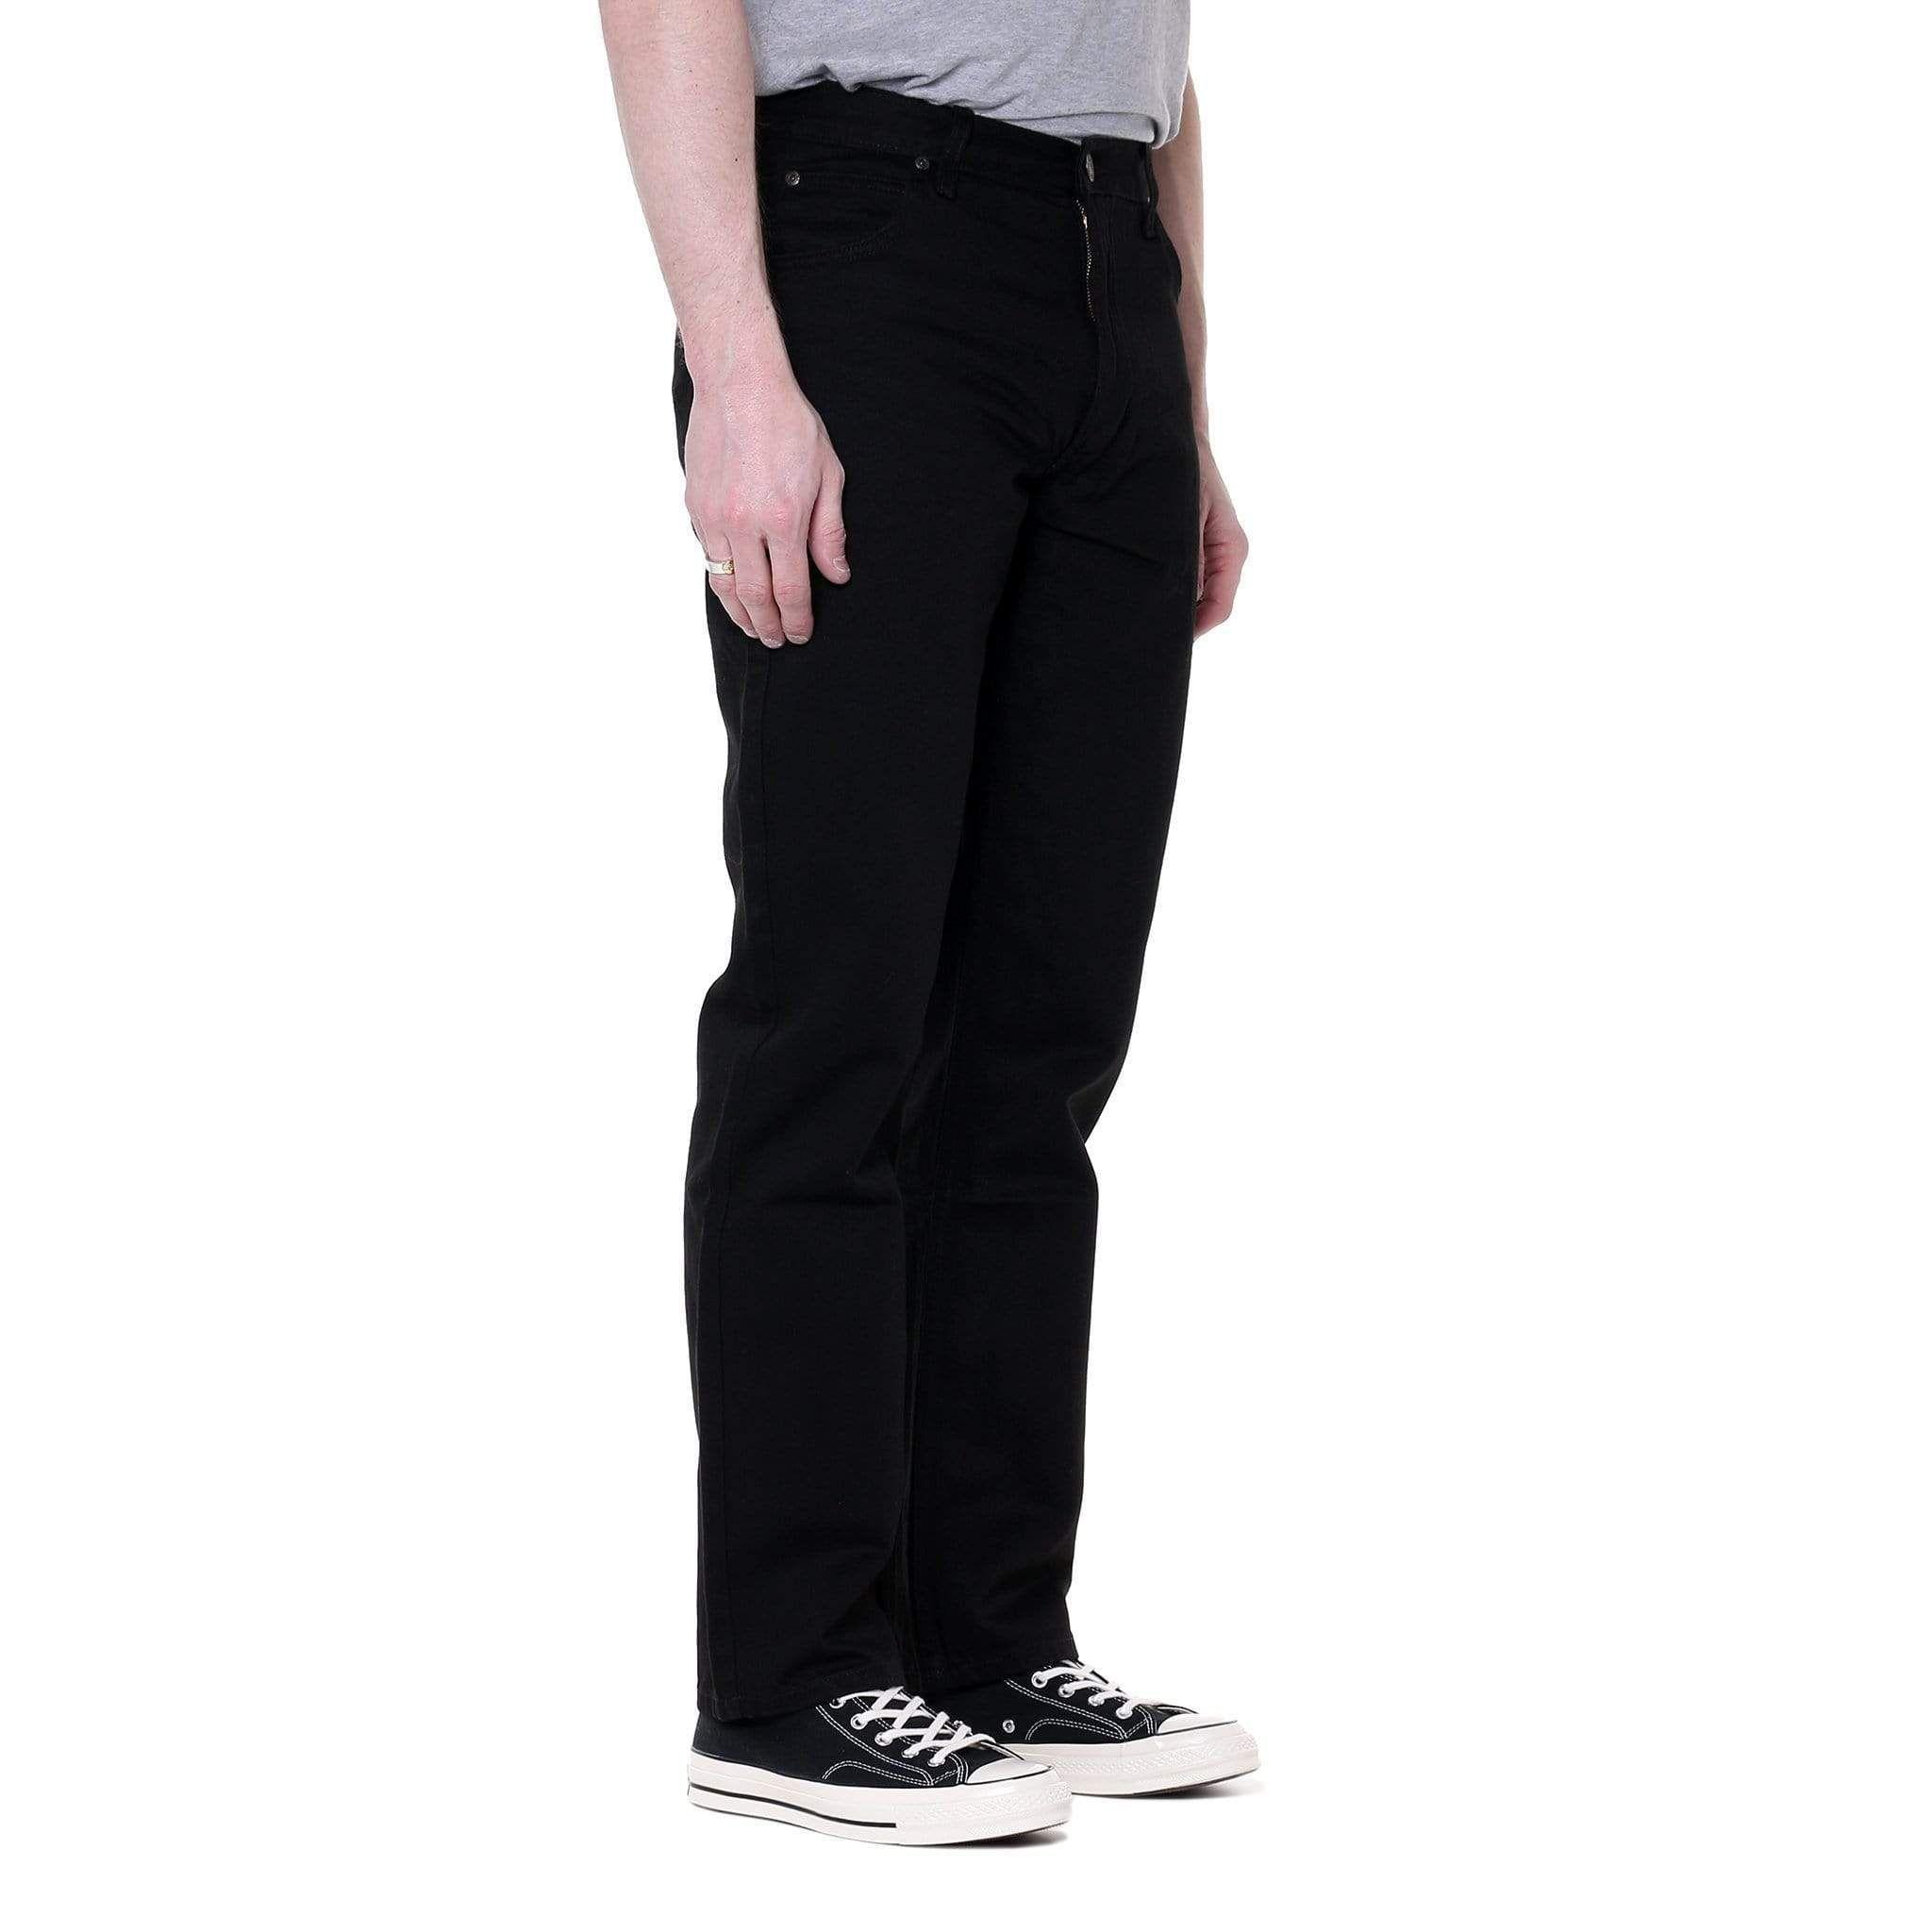 Lee Brooklyn Comfort Regular Fit Mens Jeans Black Rinse